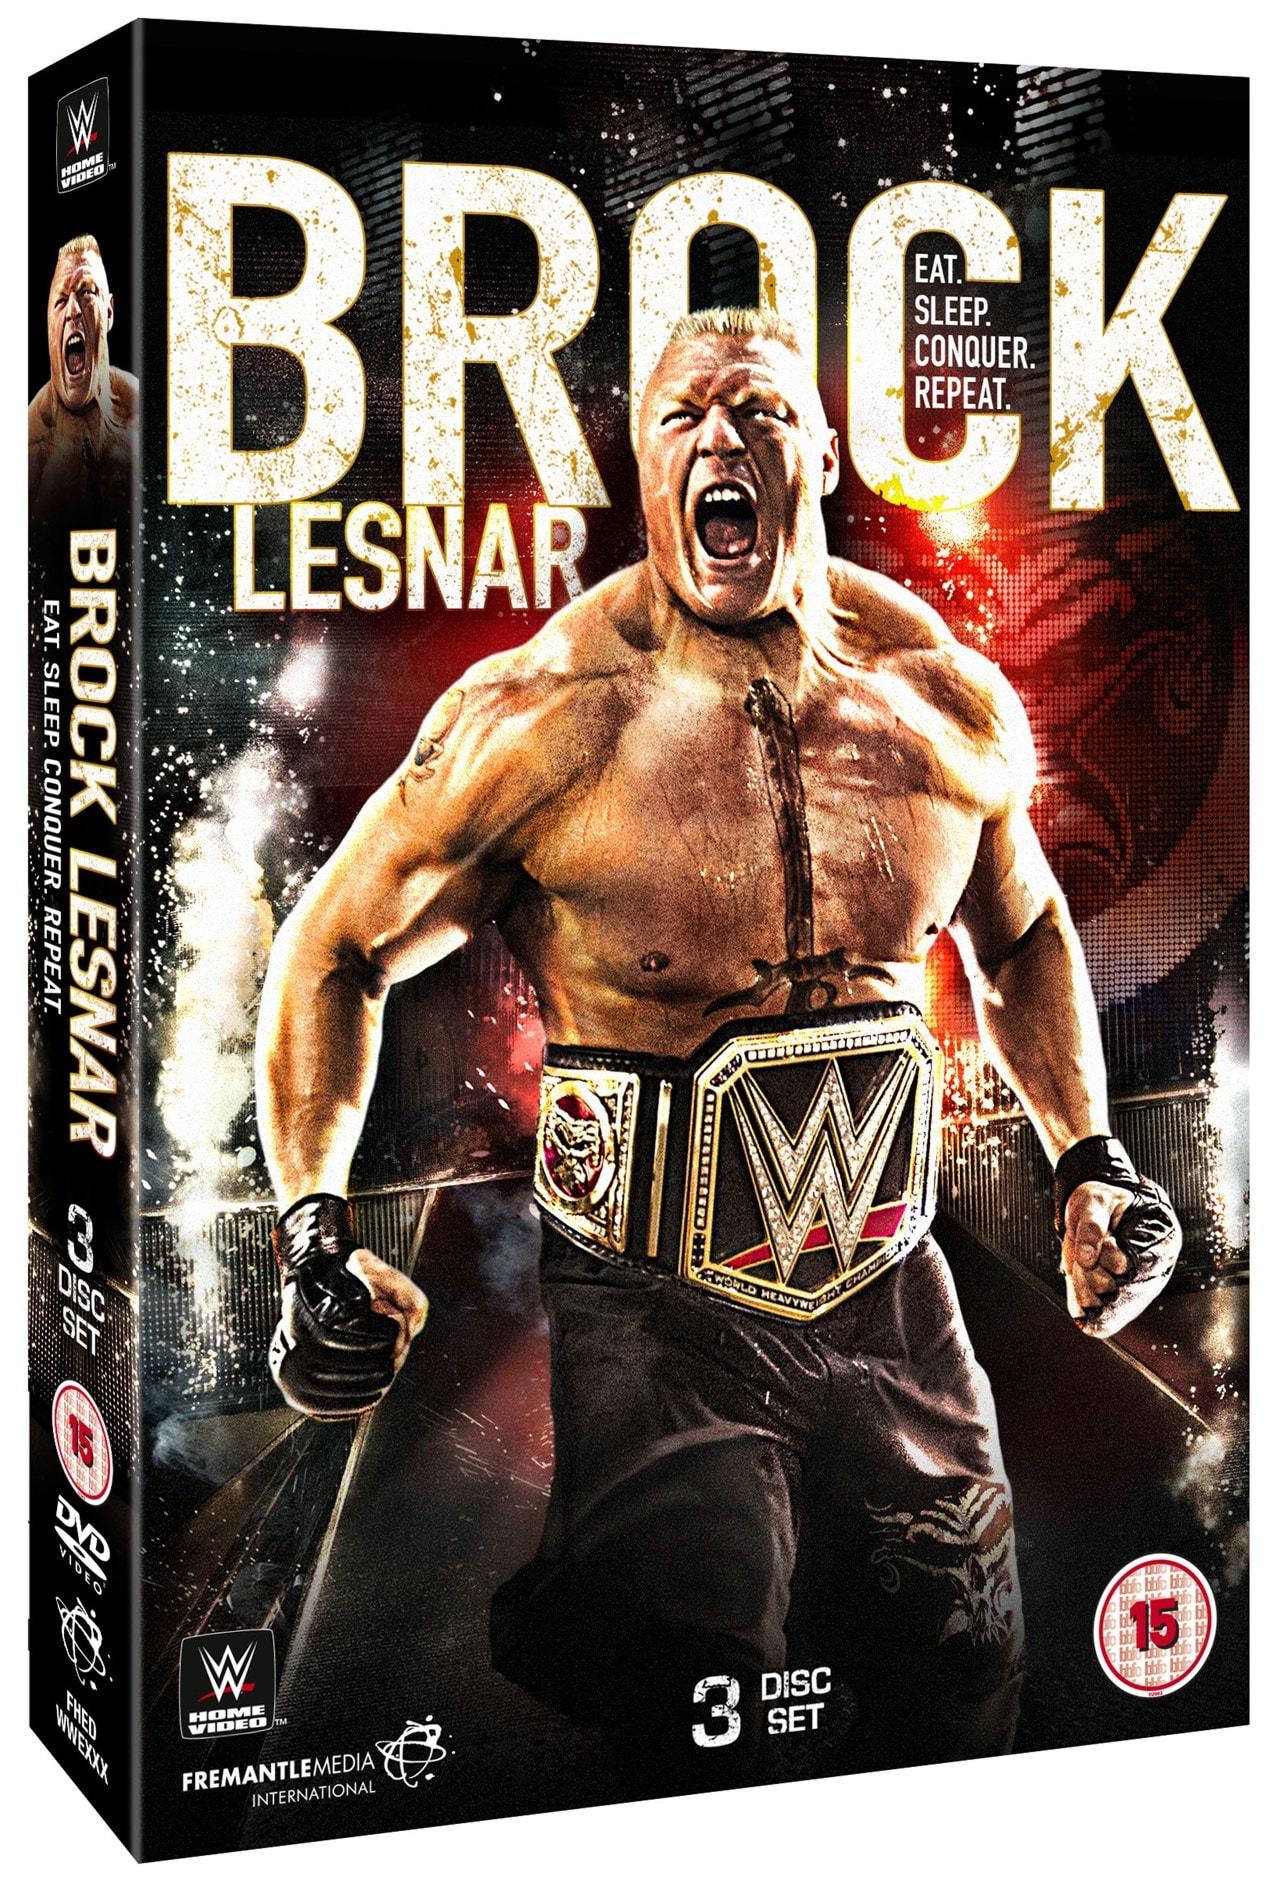 WWE: Brock Lesnar - Eat. Sleep. Conquer. Repeat. - 1